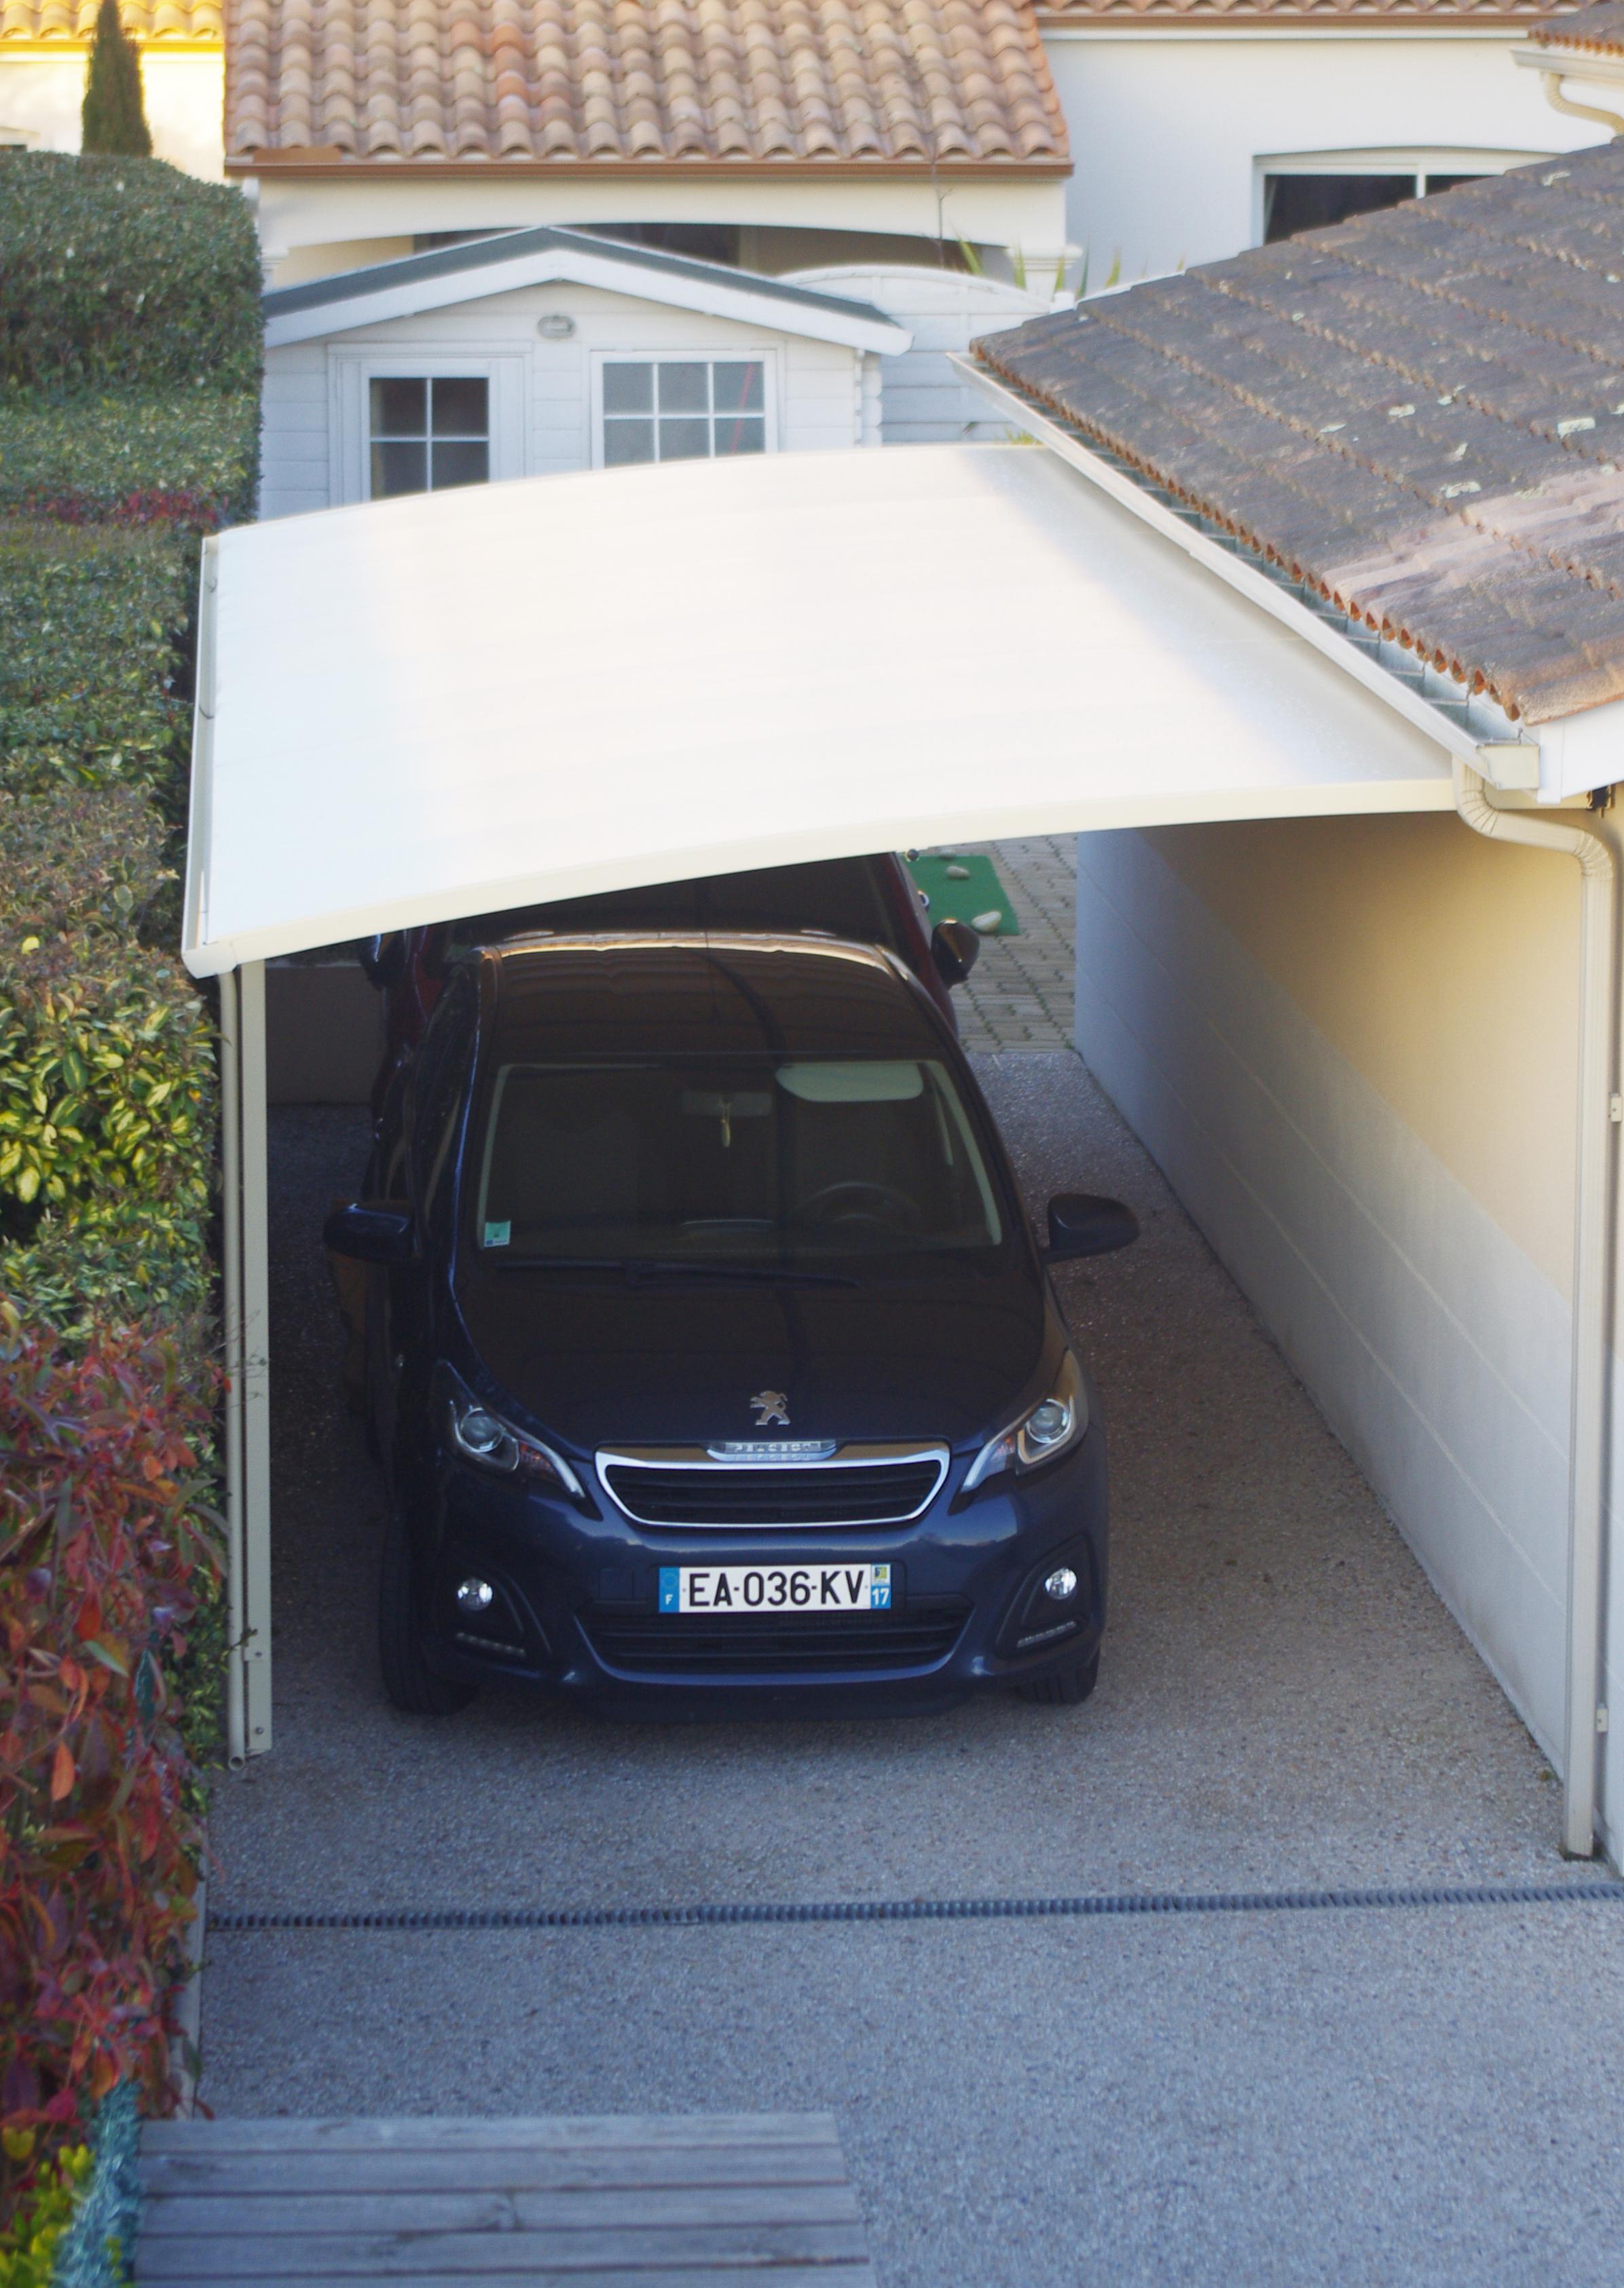 Abri voiture toile tendue